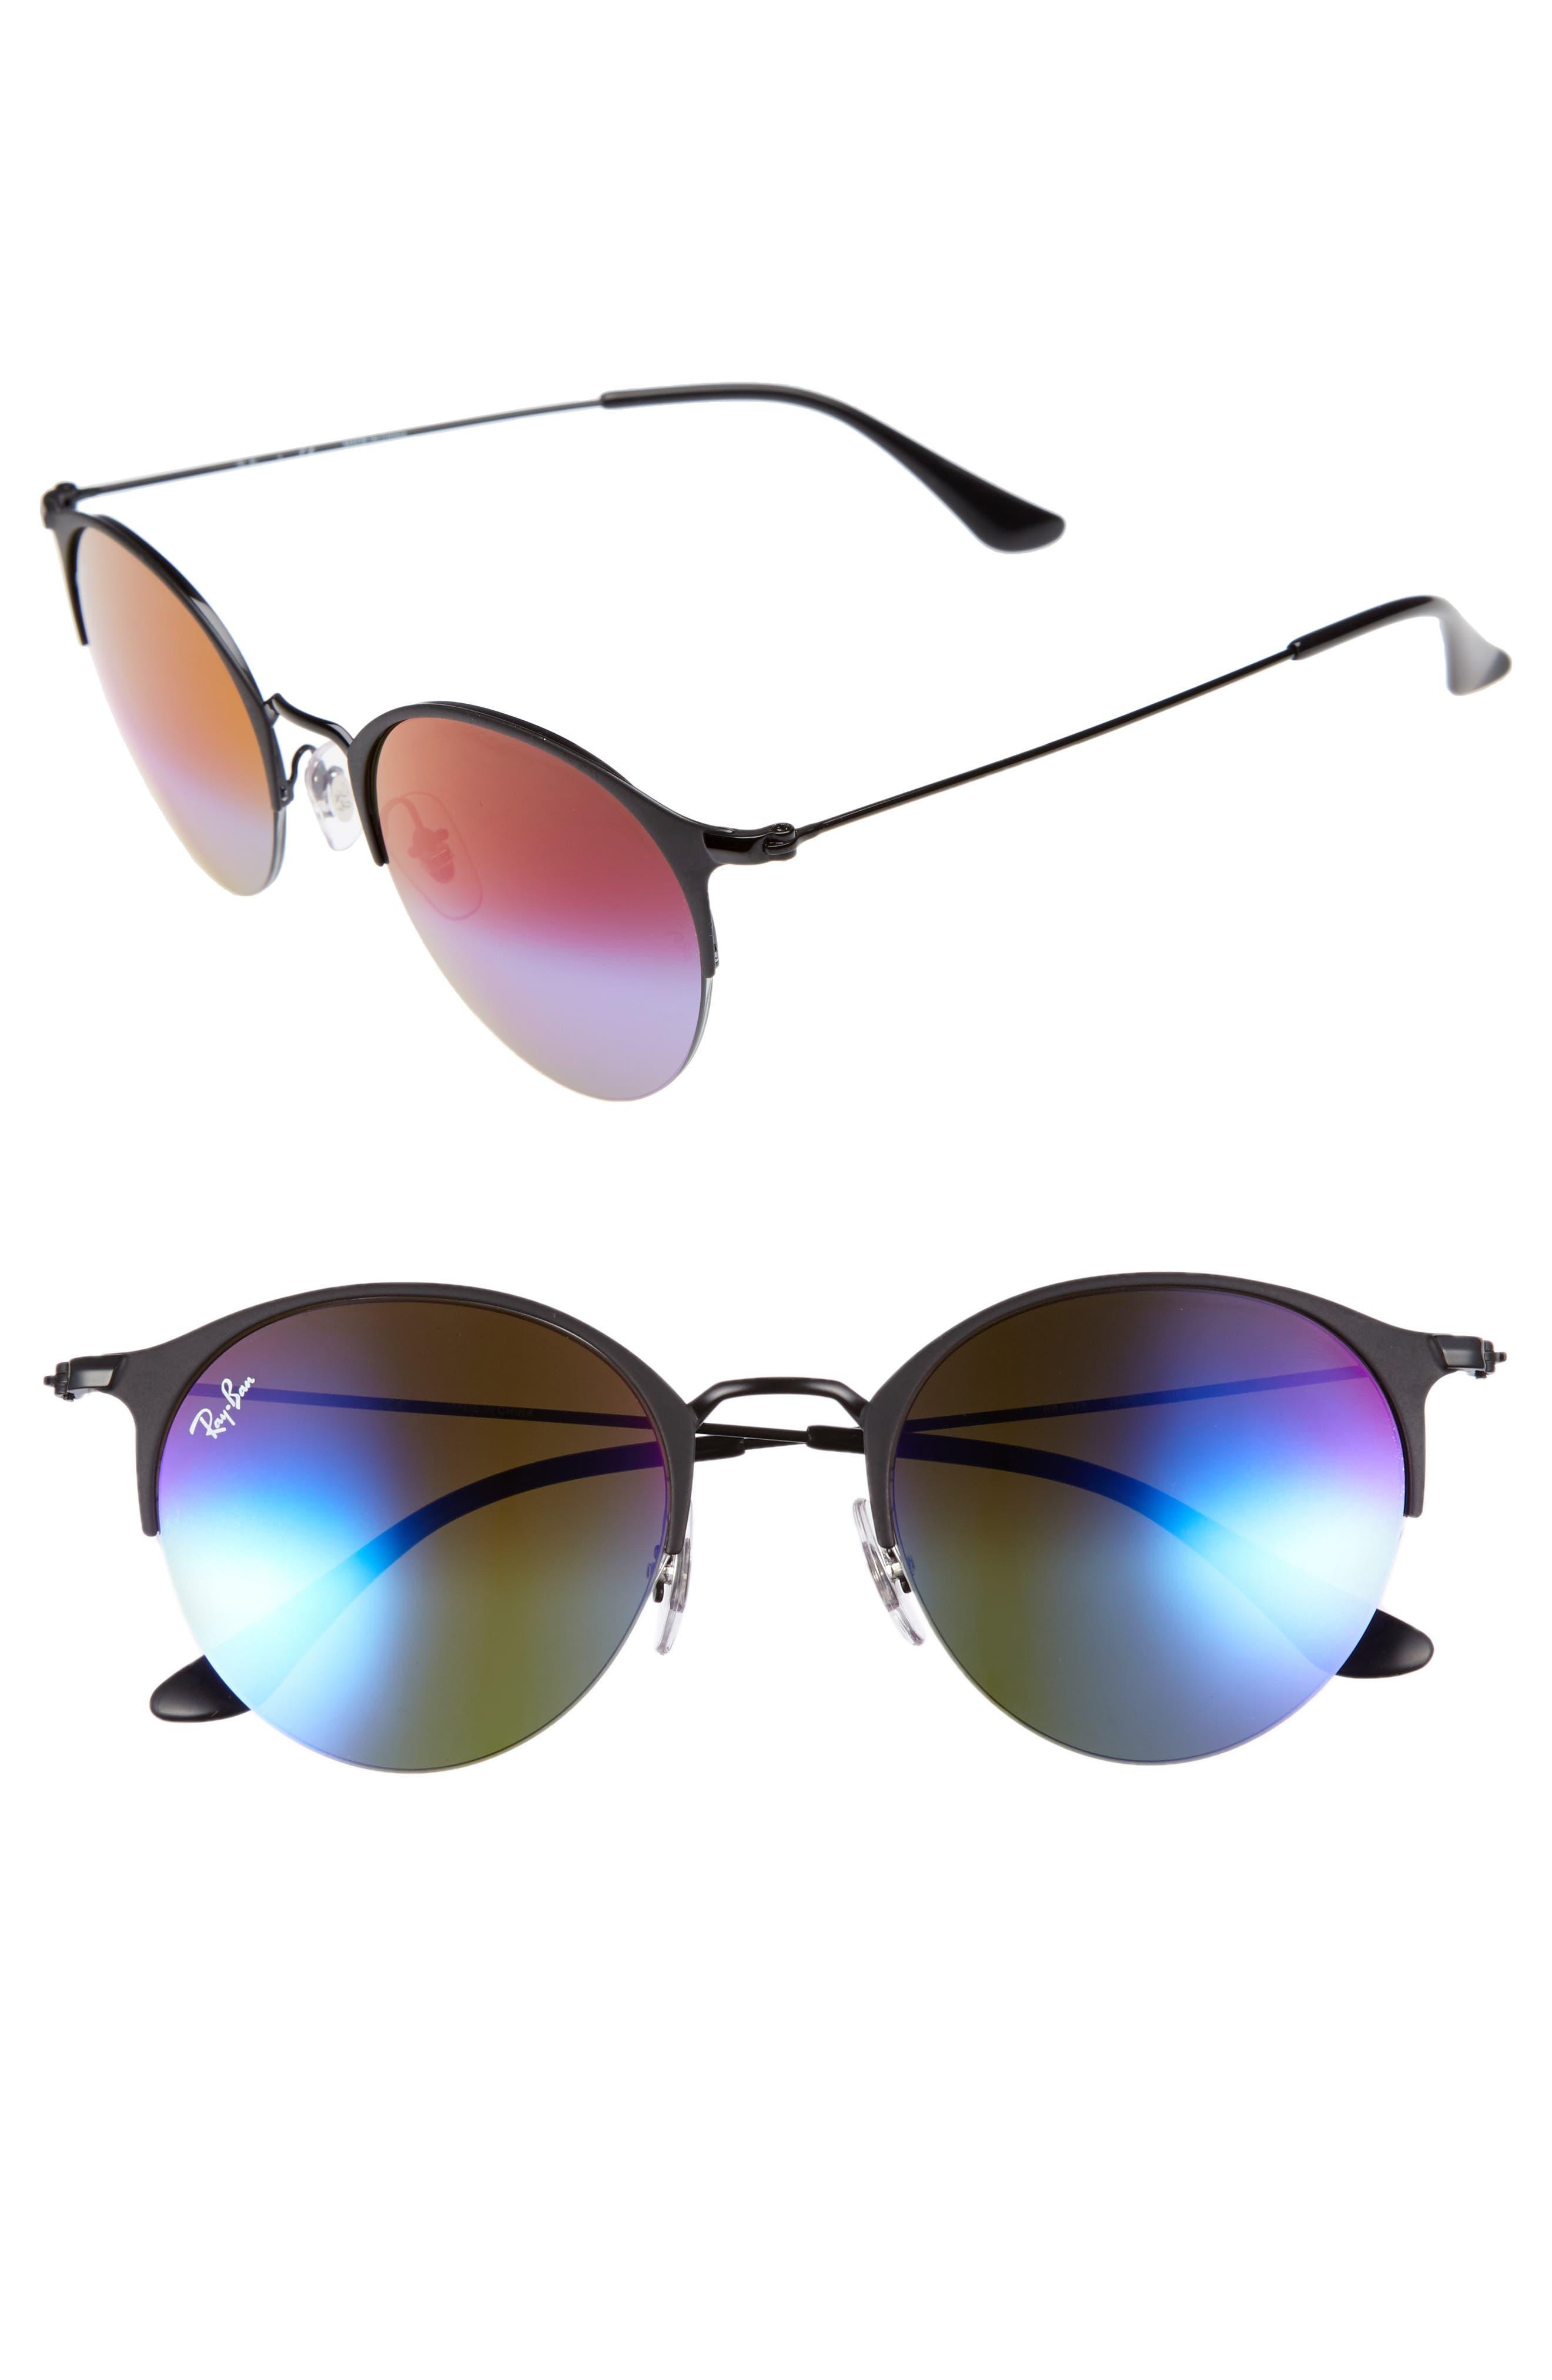 50mm Gradient Mirrored Sunglasses,                             Main thumbnail 1, color,                             001